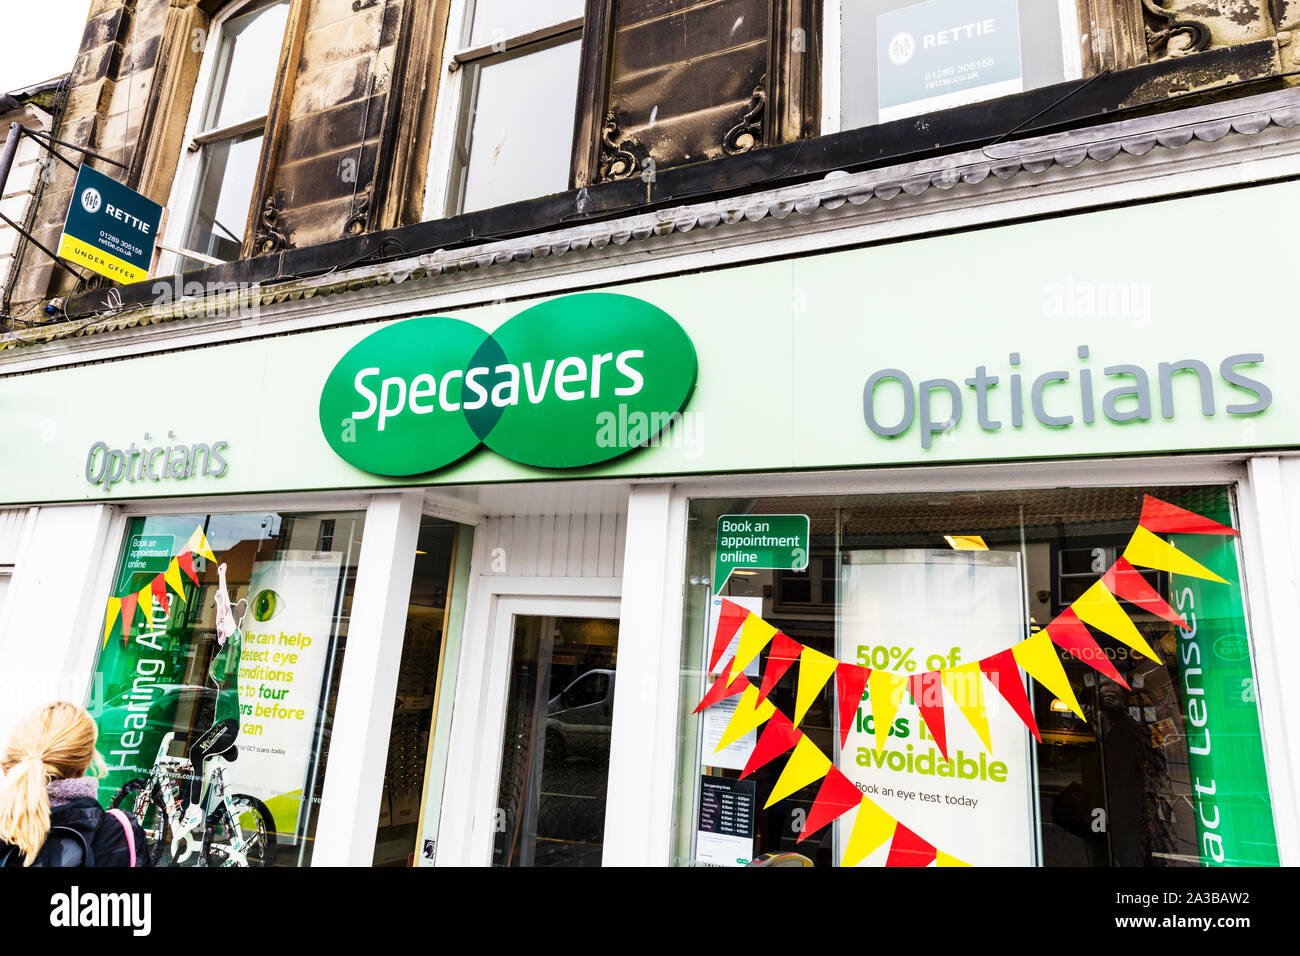 Specsavers shop sign optician high street shops, Specsavers opticians, Specsavers sign, Specsavers optician, Specsavers shop, Specsavers store, sign Stock Photo